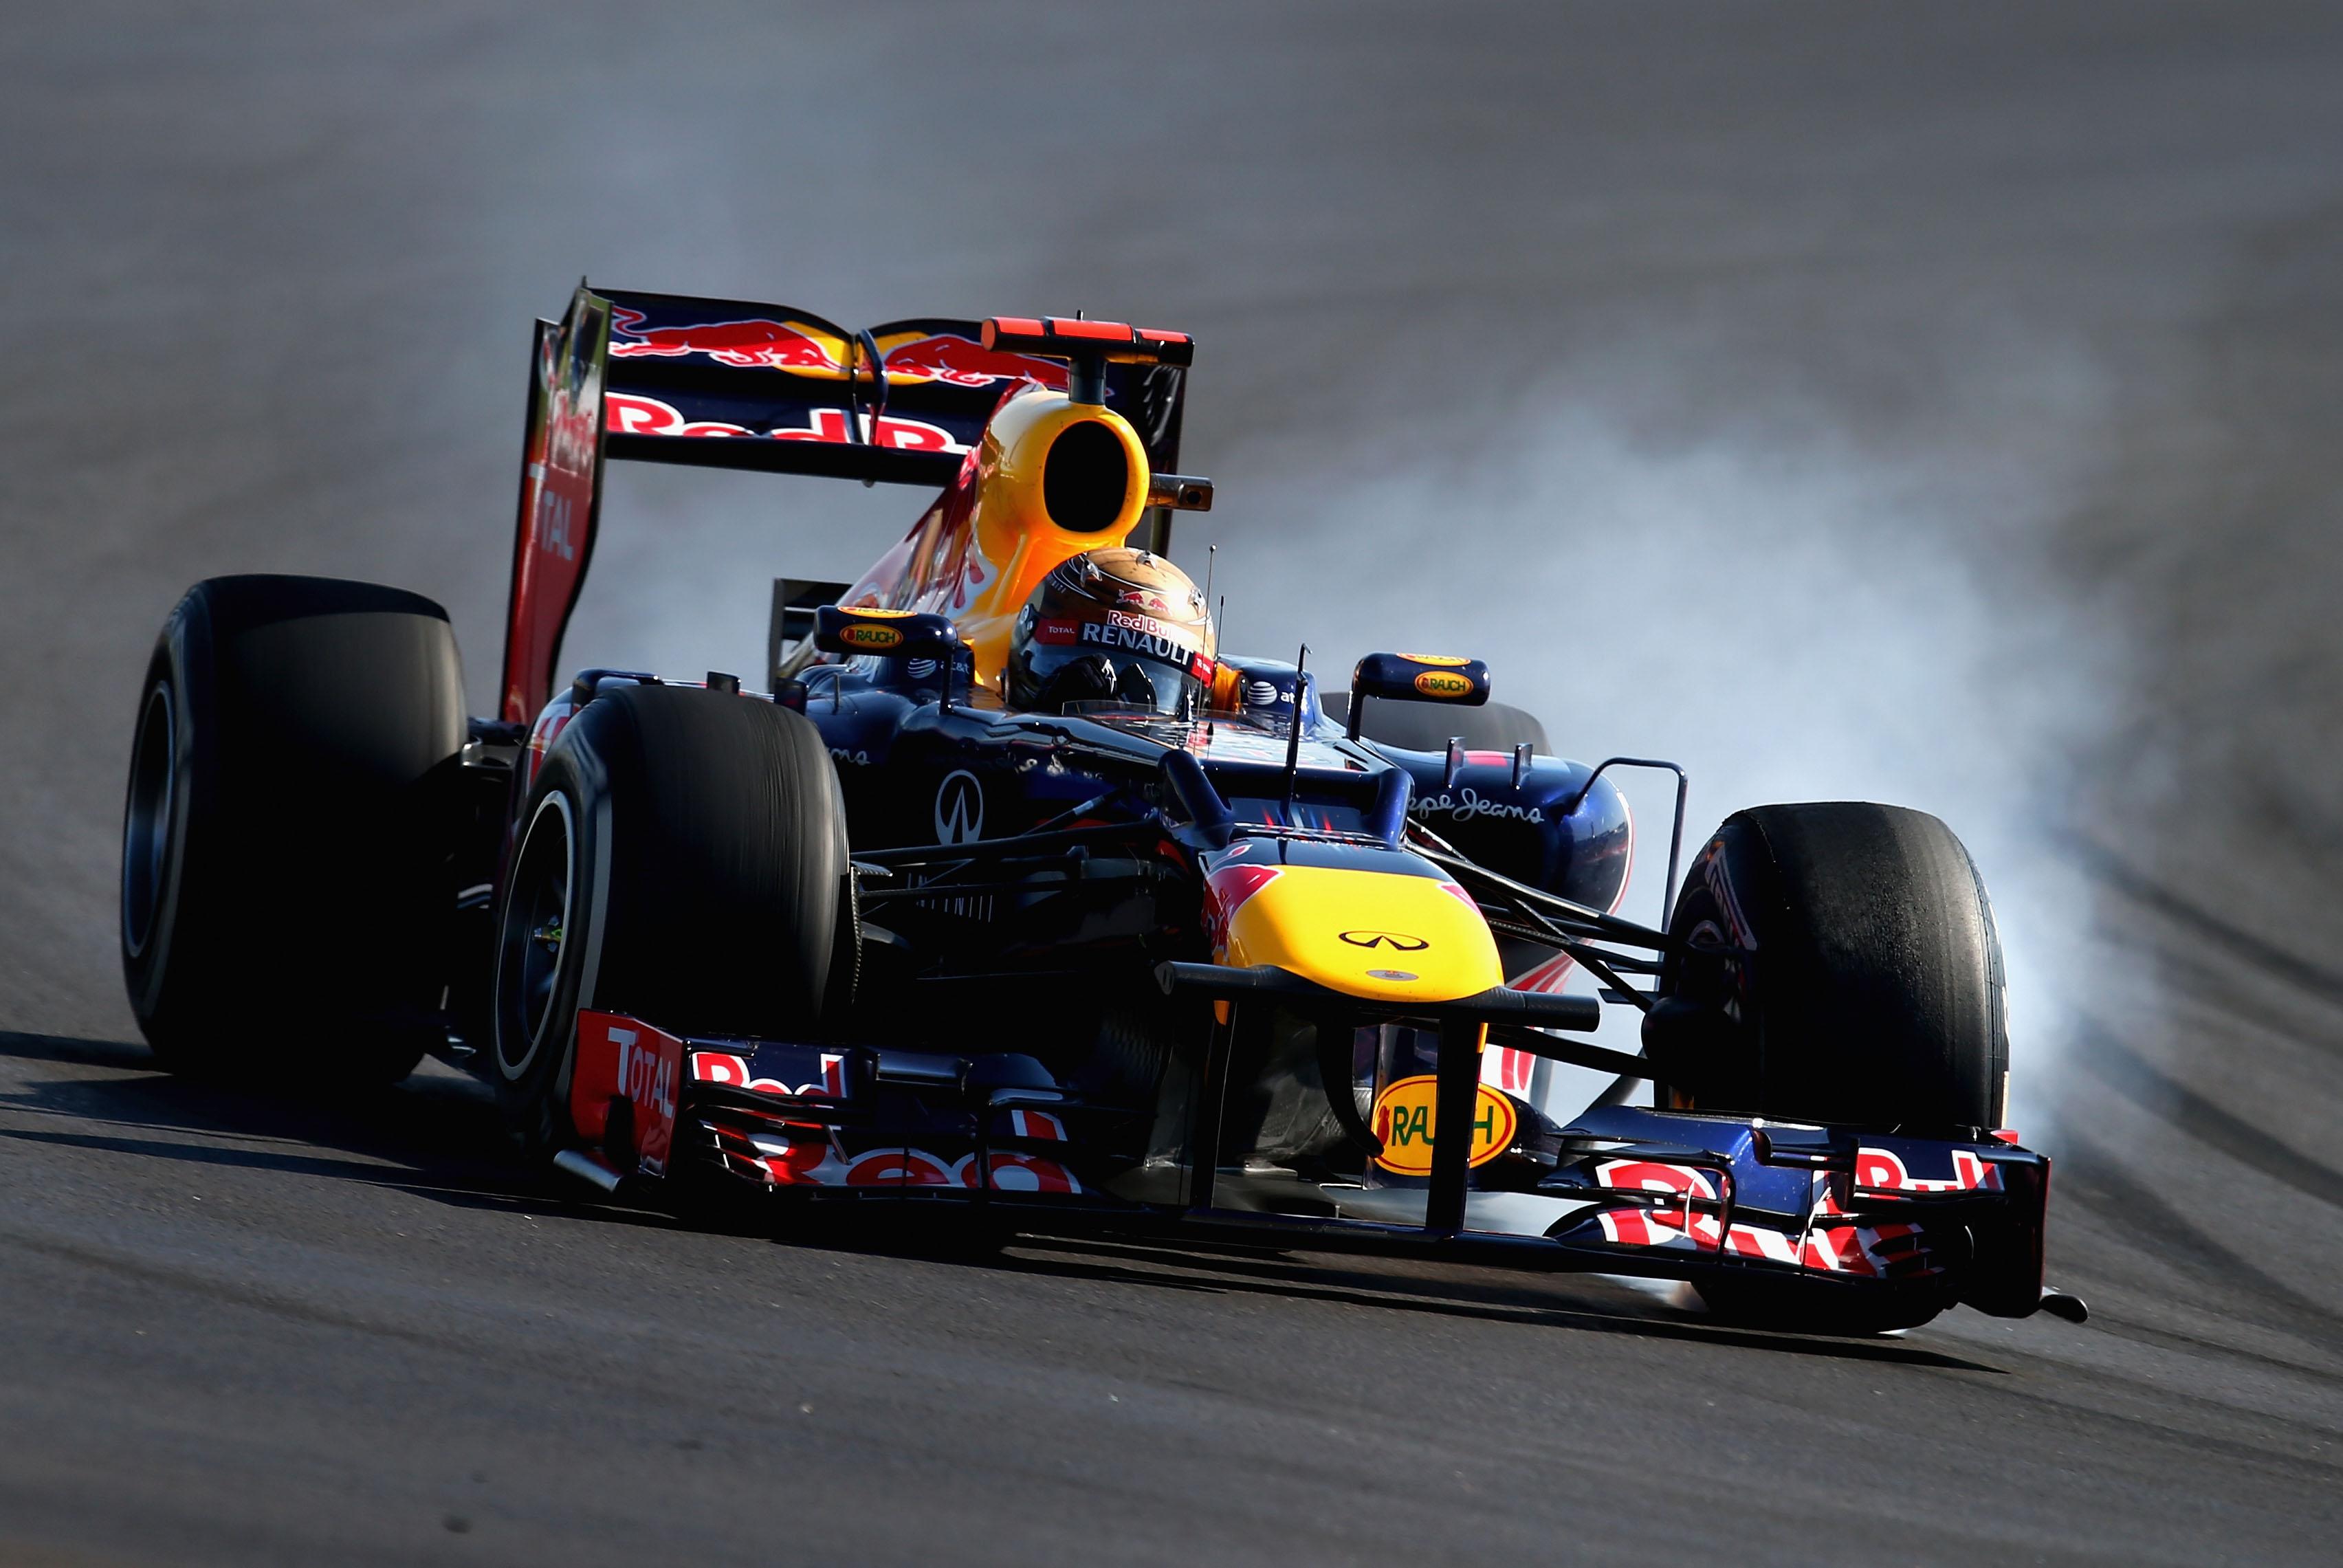 Russian Grand Prix set for November 2014